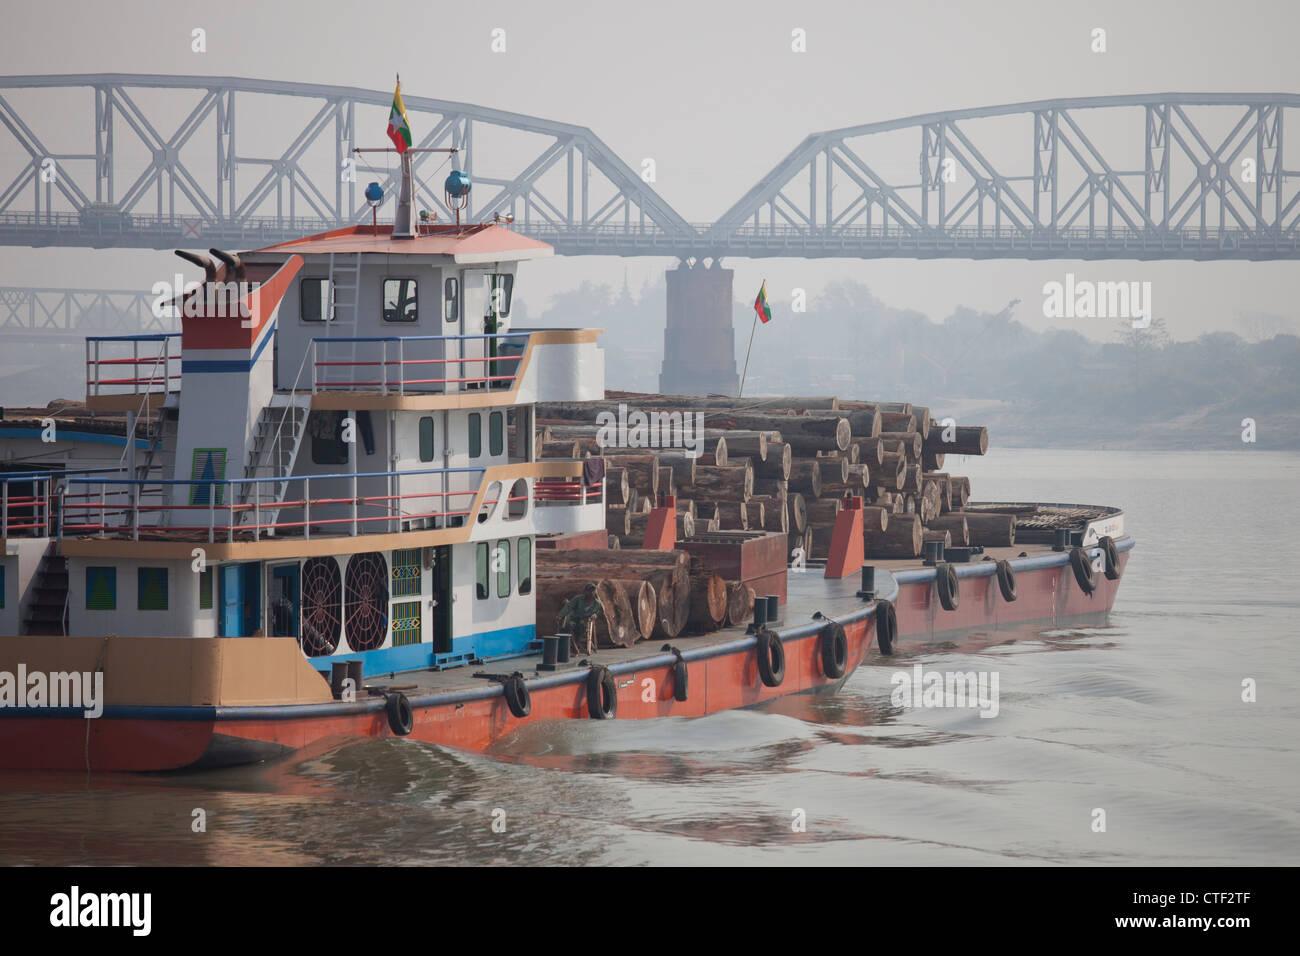 Barge tirant des grumes sur la rivière Irrawaddy près de Mandalay, Myanmar Photo Stock